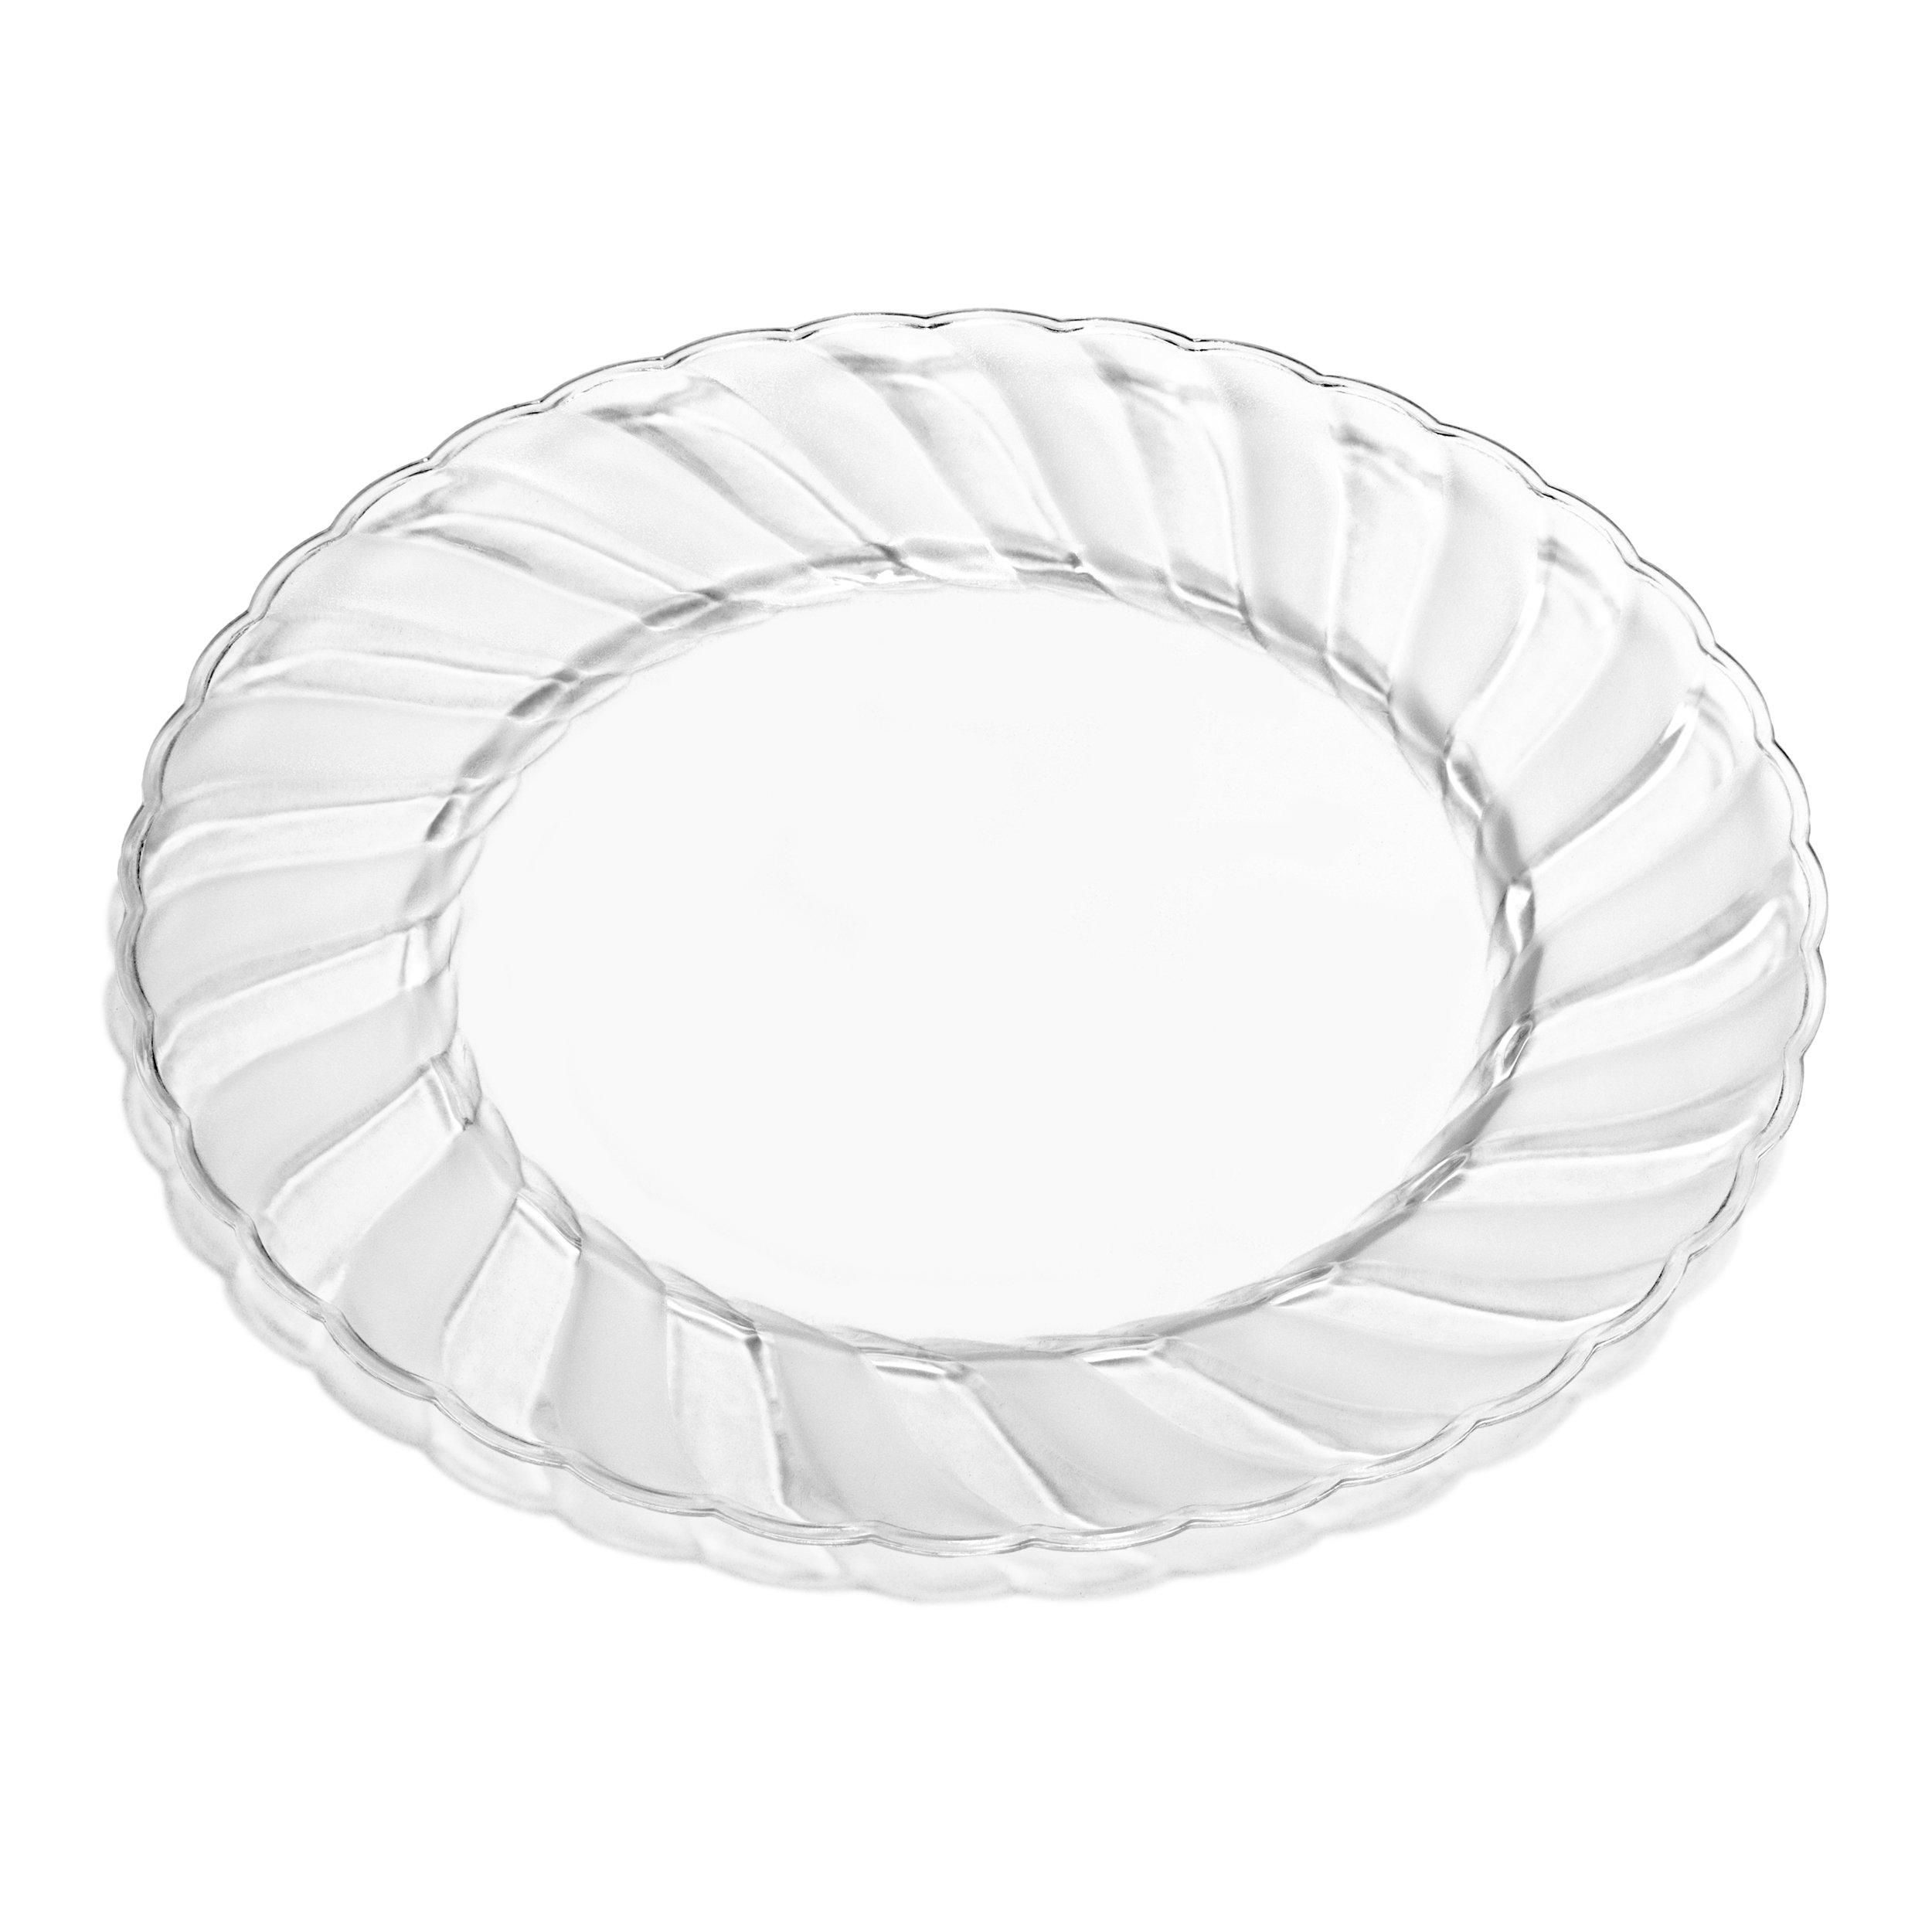 Premium Clear Plastic Plates By Alpha Sigma - 100pcs 9  Food Grade Clear Plastic Plates - Washable Reusable - Perfect For Birthdays Parties Celebrations ...  sc 1 st  eBay & Premium Clear Plastic Plates By Alpha Sigma - 100pcs 9